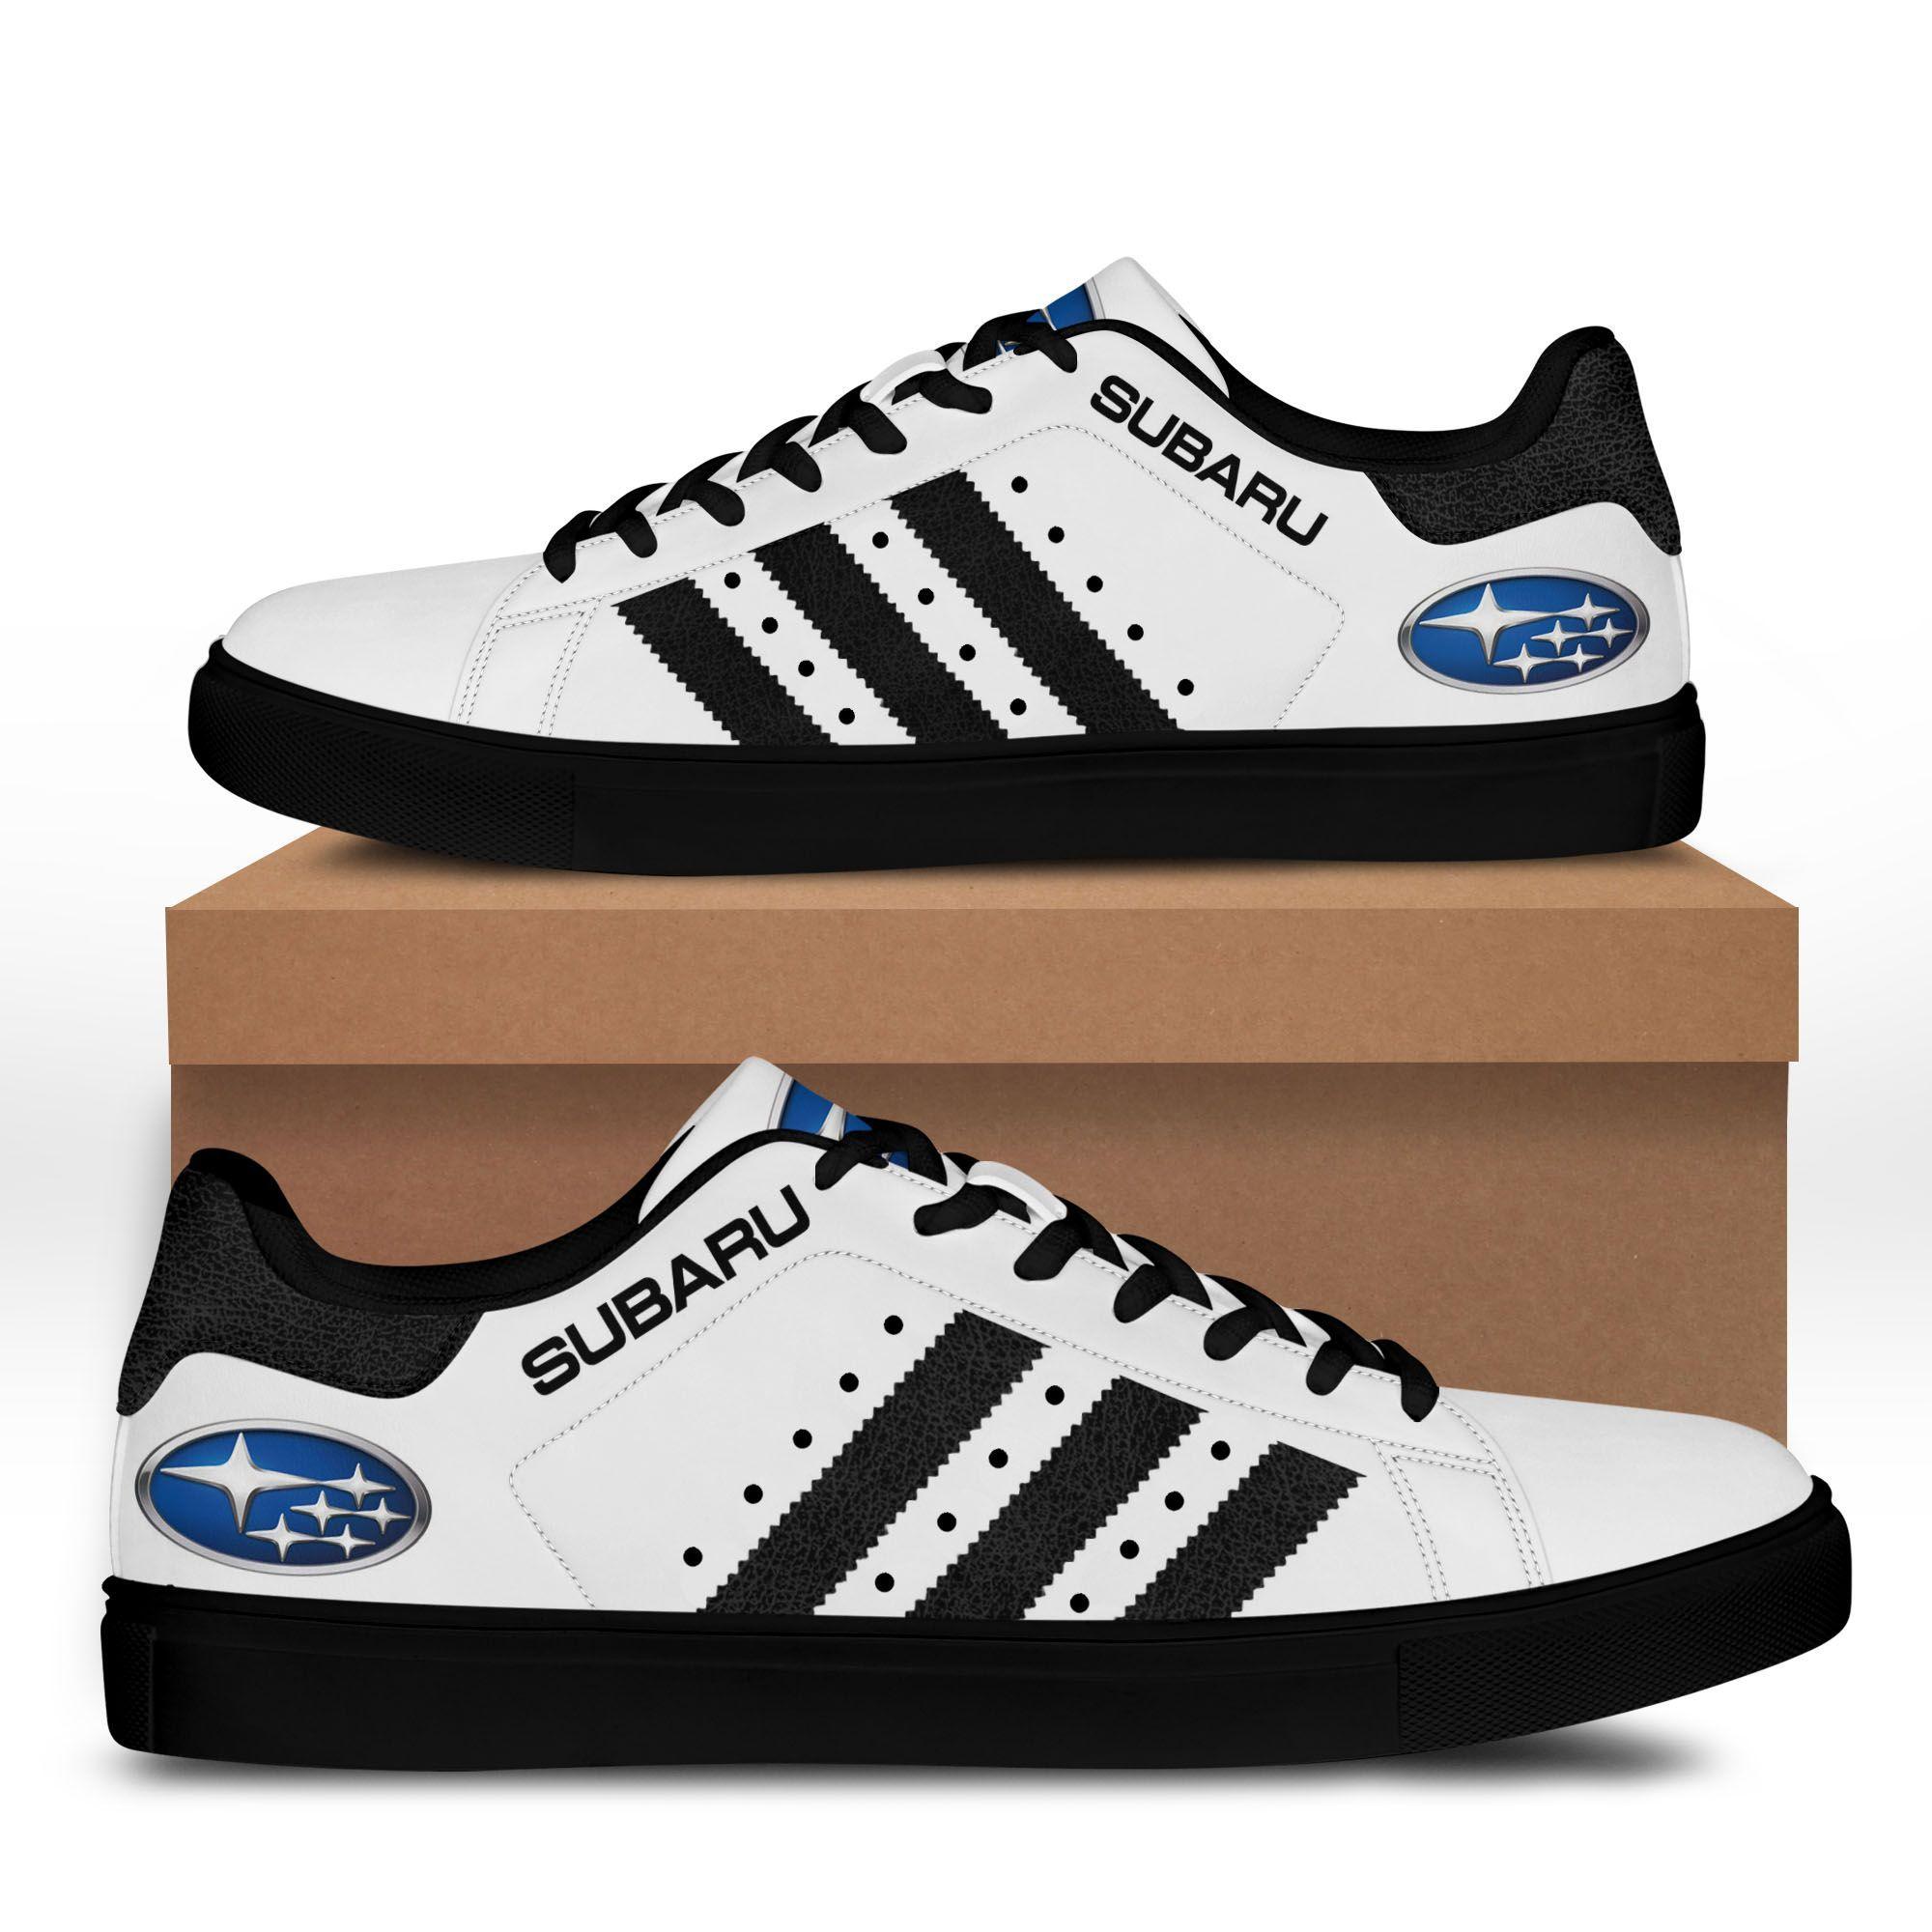 Subaru White Stan Smith Shoes